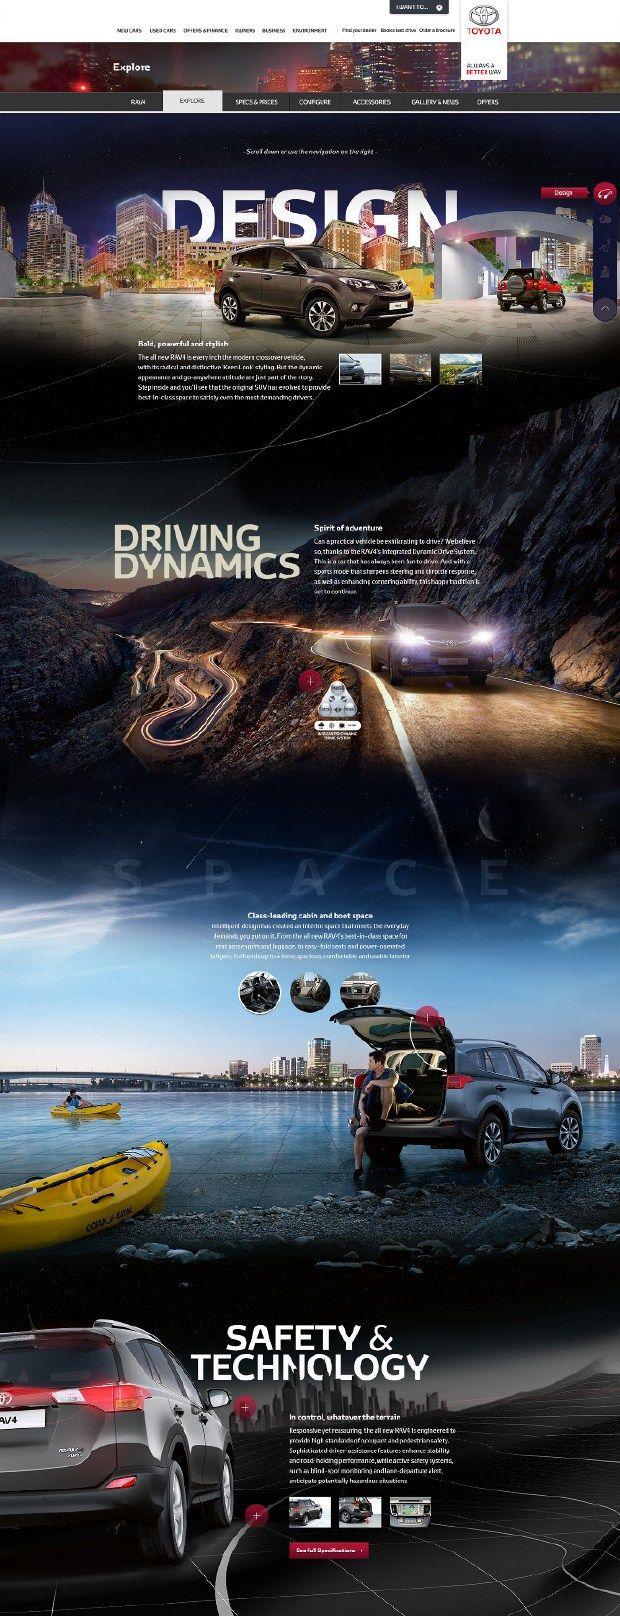 Cool Automotive Web Design on the Internet. Toyota. #automotive #webdesign #webdevelopment #website